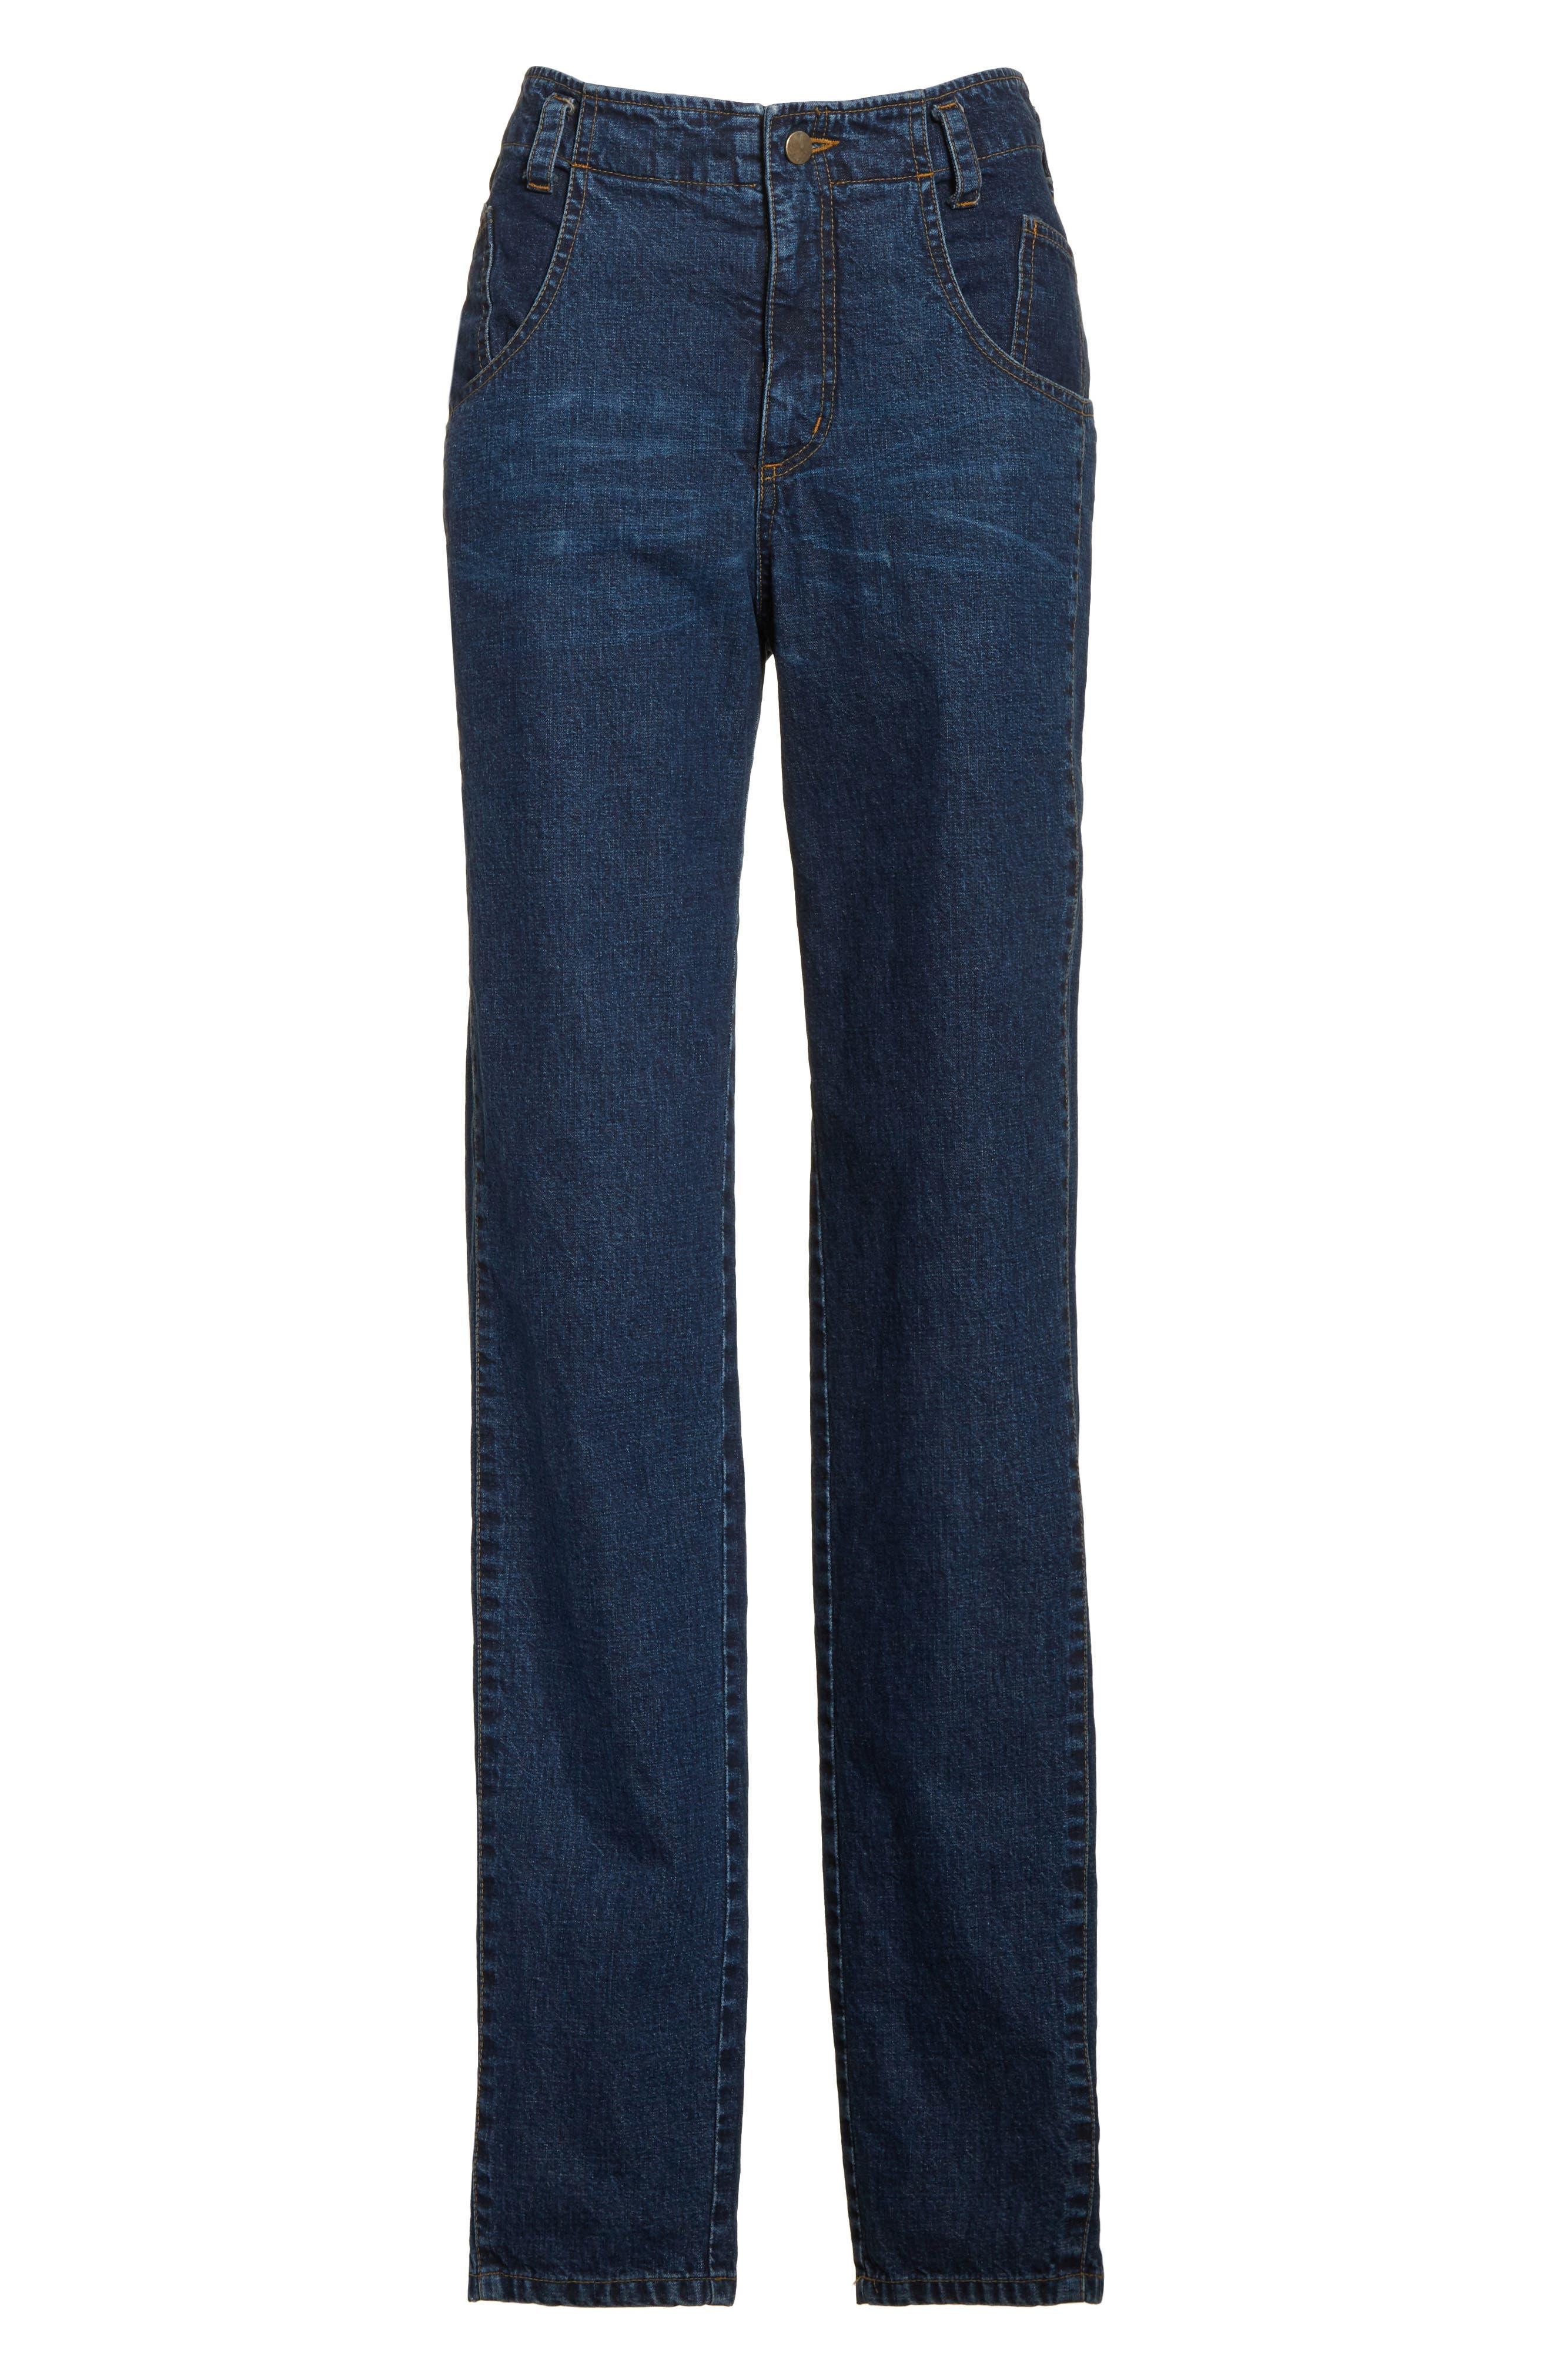 Long Trigger Straight Leg Jeans,                             Alternate thumbnail 6, color,                             420